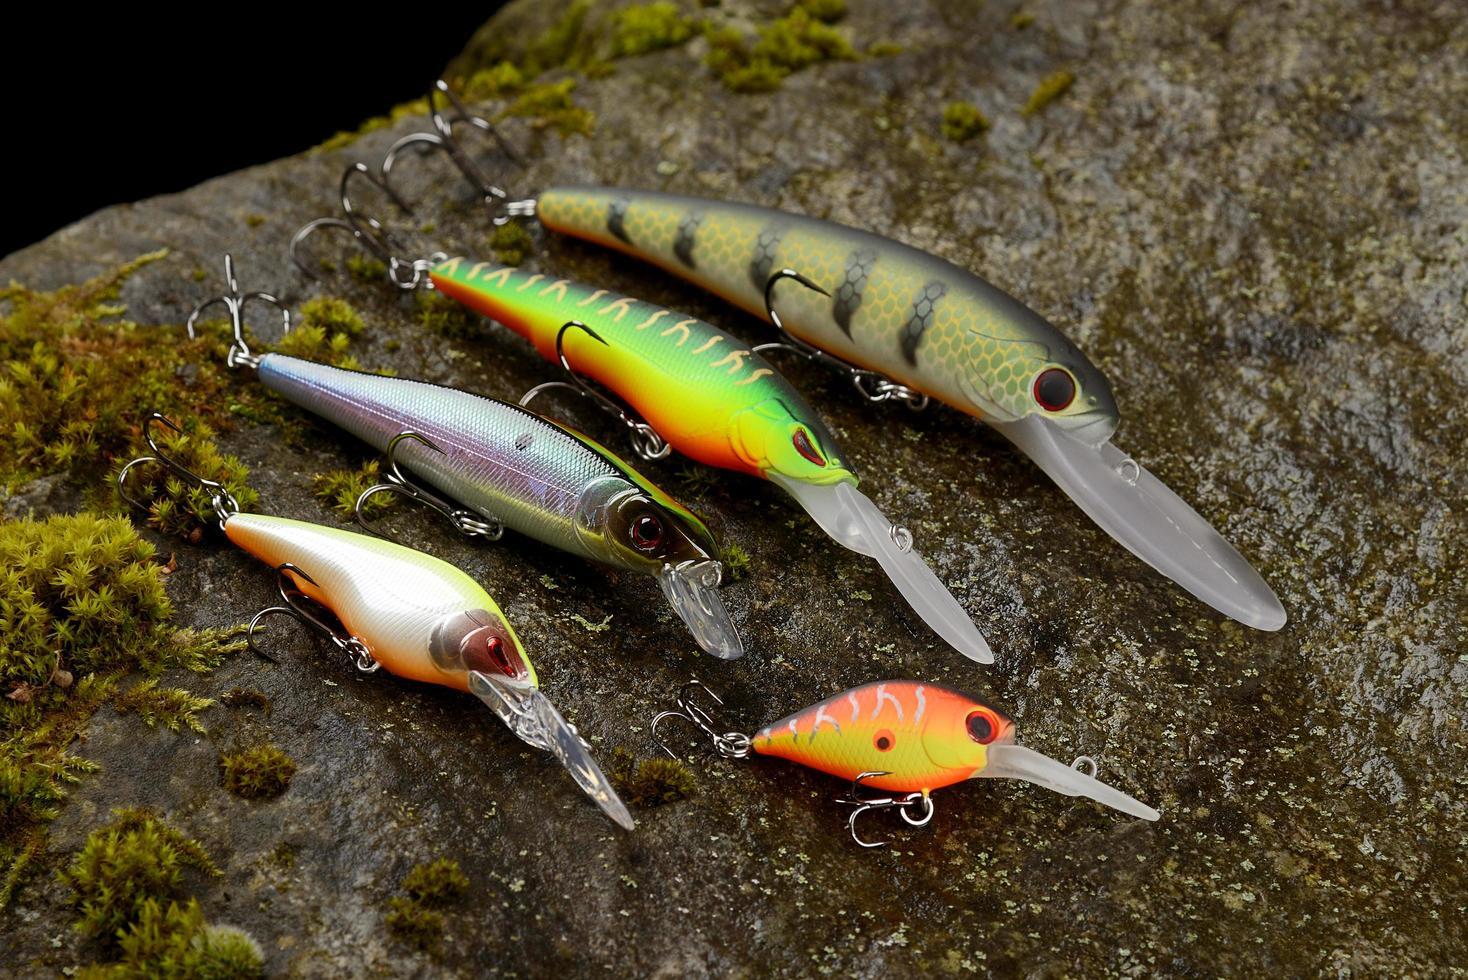 groep vissen lokt wobblers op een natte steen met mos foto